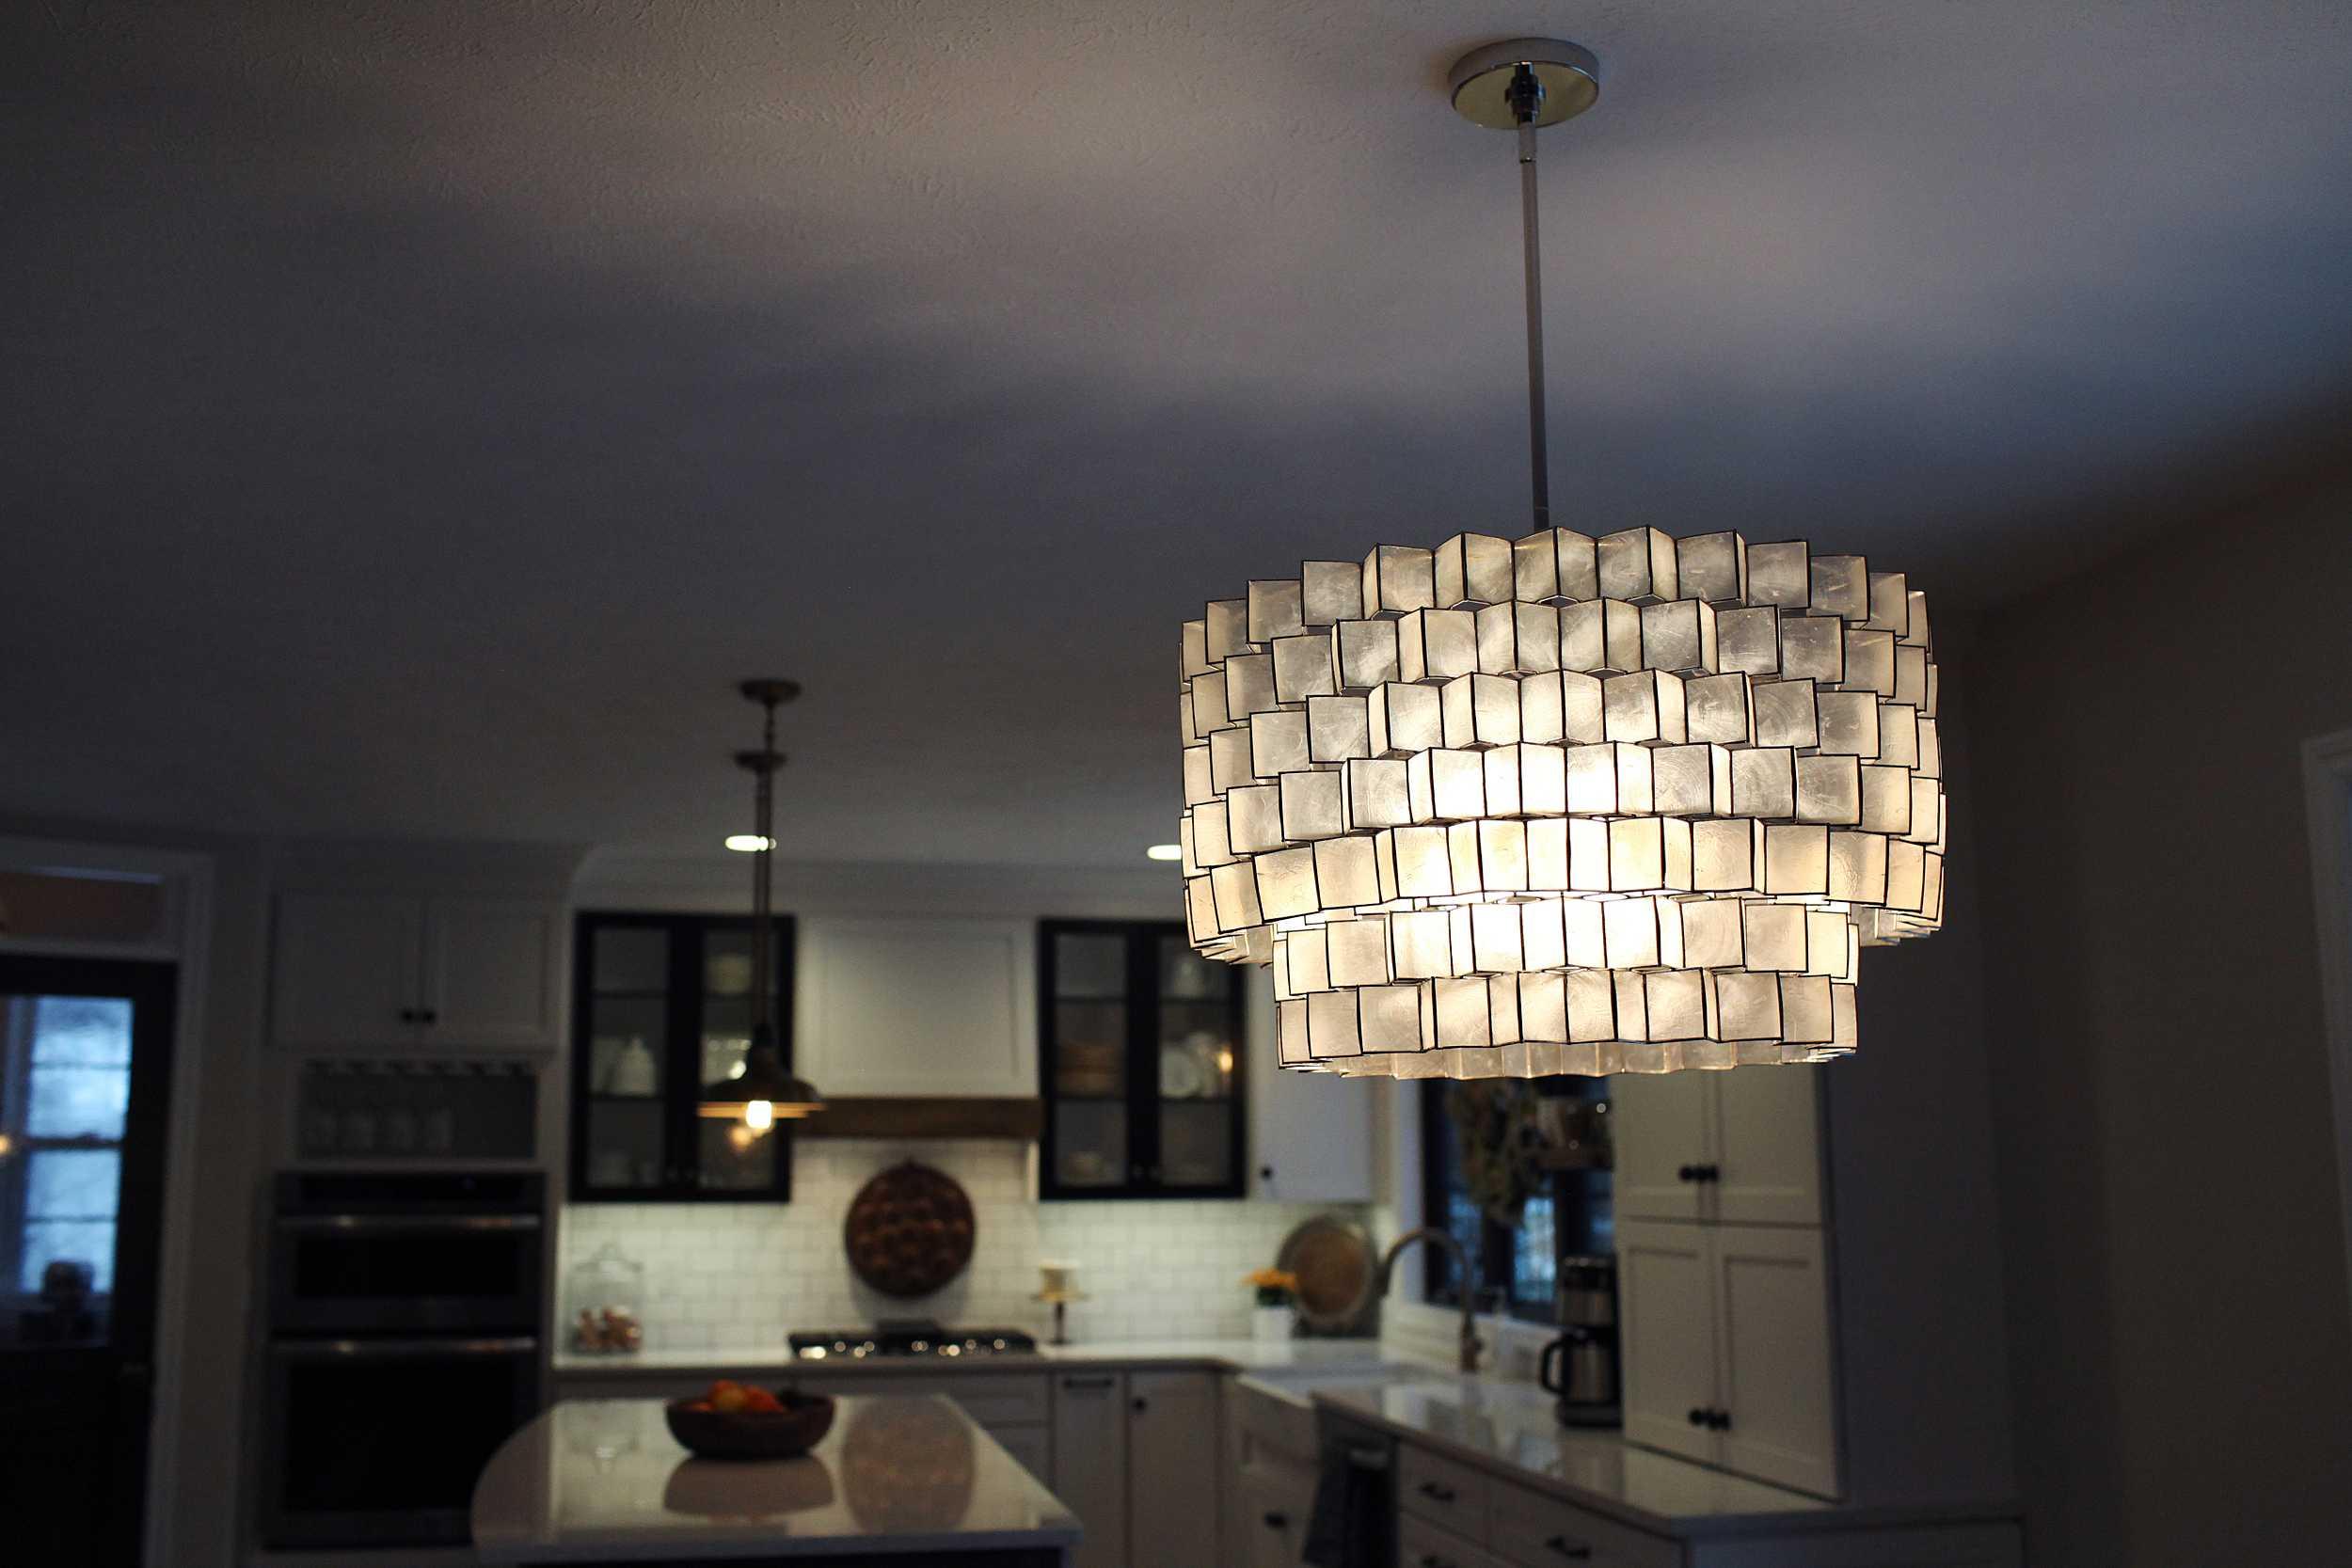 kitchen_remodel (11).jpg